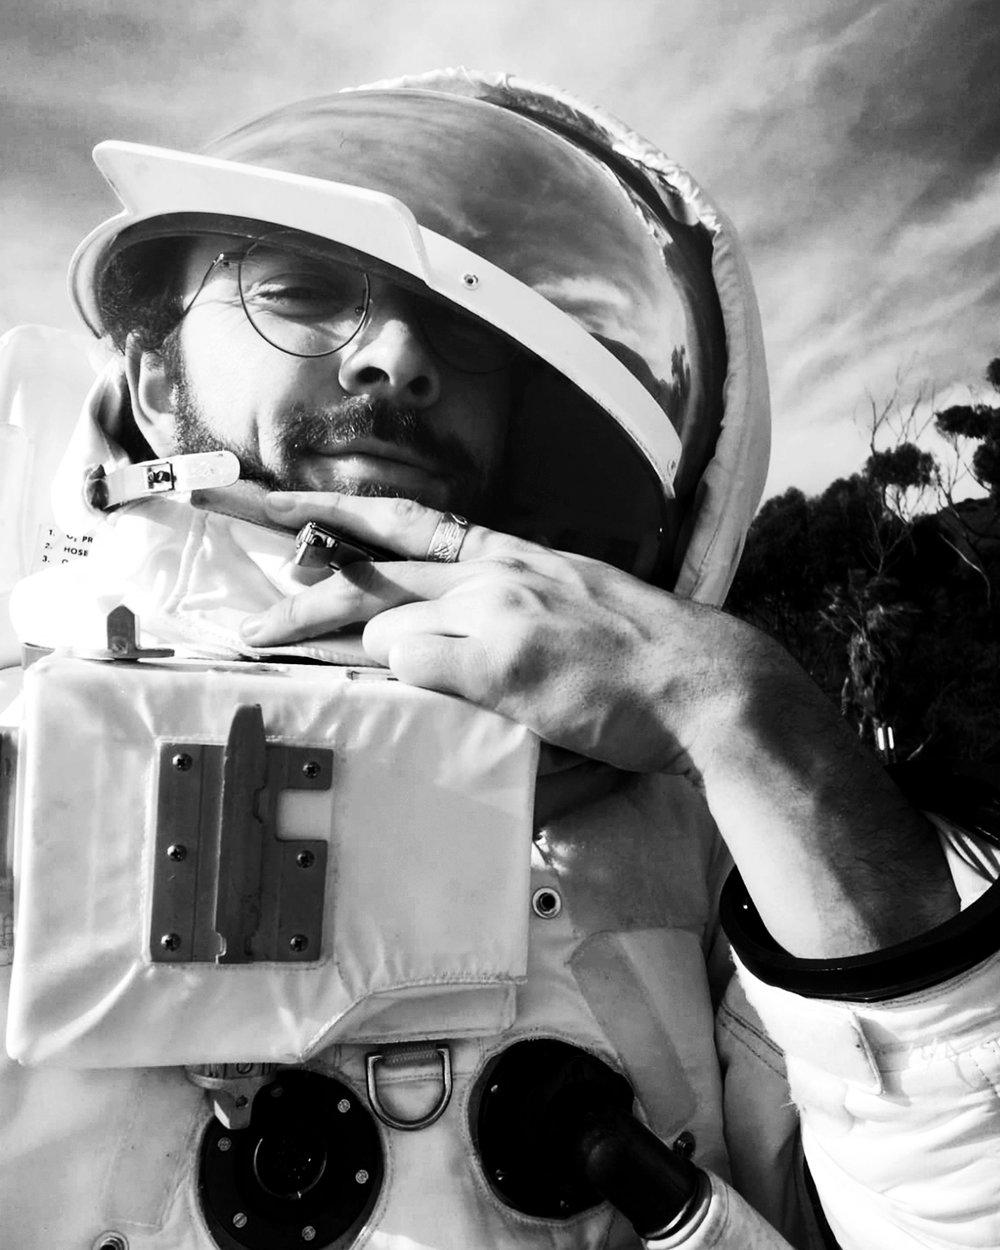 Pompon_cosmonaute_small.jpg